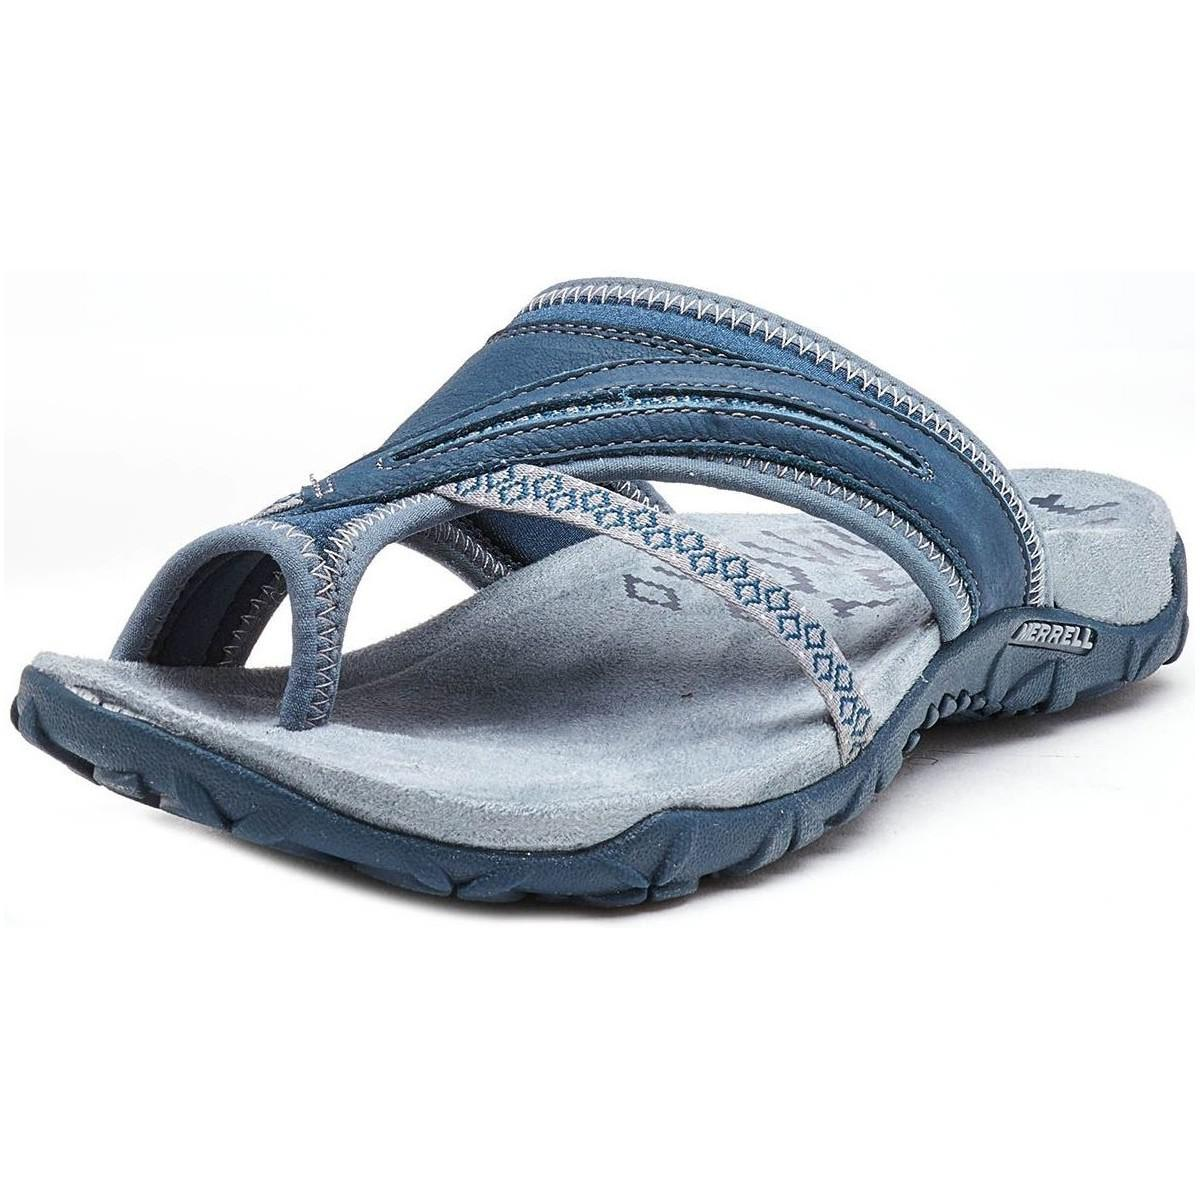 281ebc024 Merrell - Terran Post Ii Women Sandals In Slate Blue J98750 Women s Sandals  In Blue -. View fullscreen